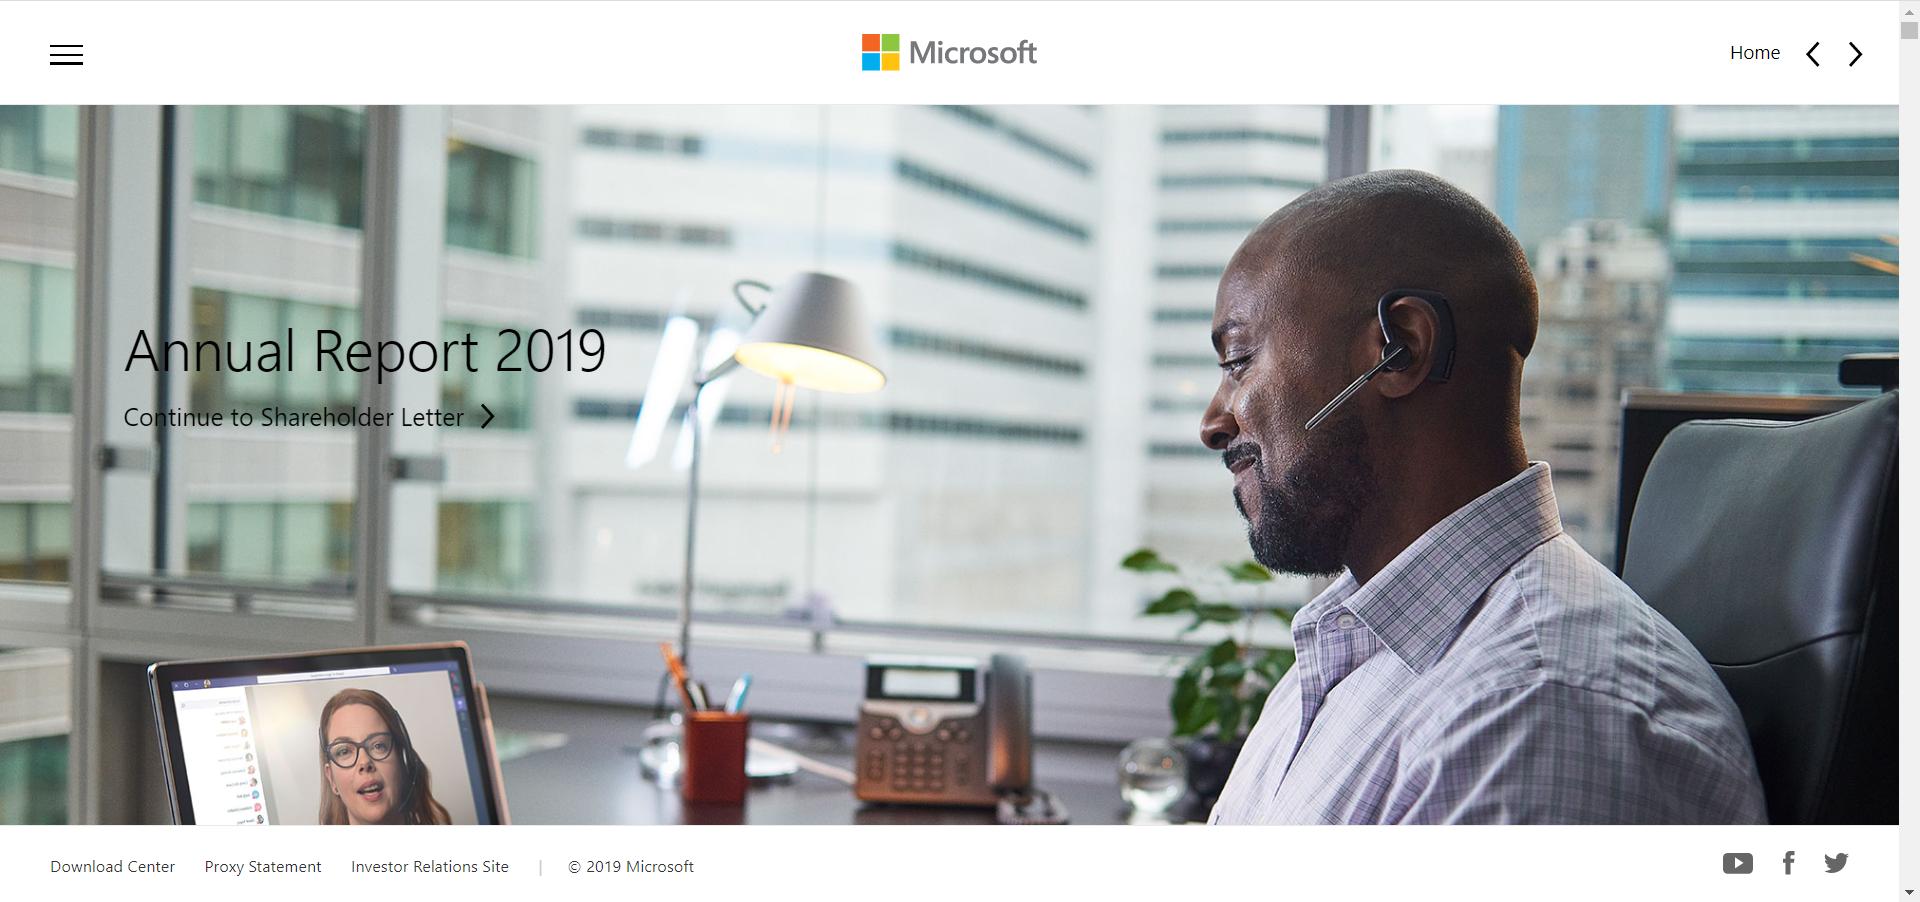 Microsoft Annual Report Top